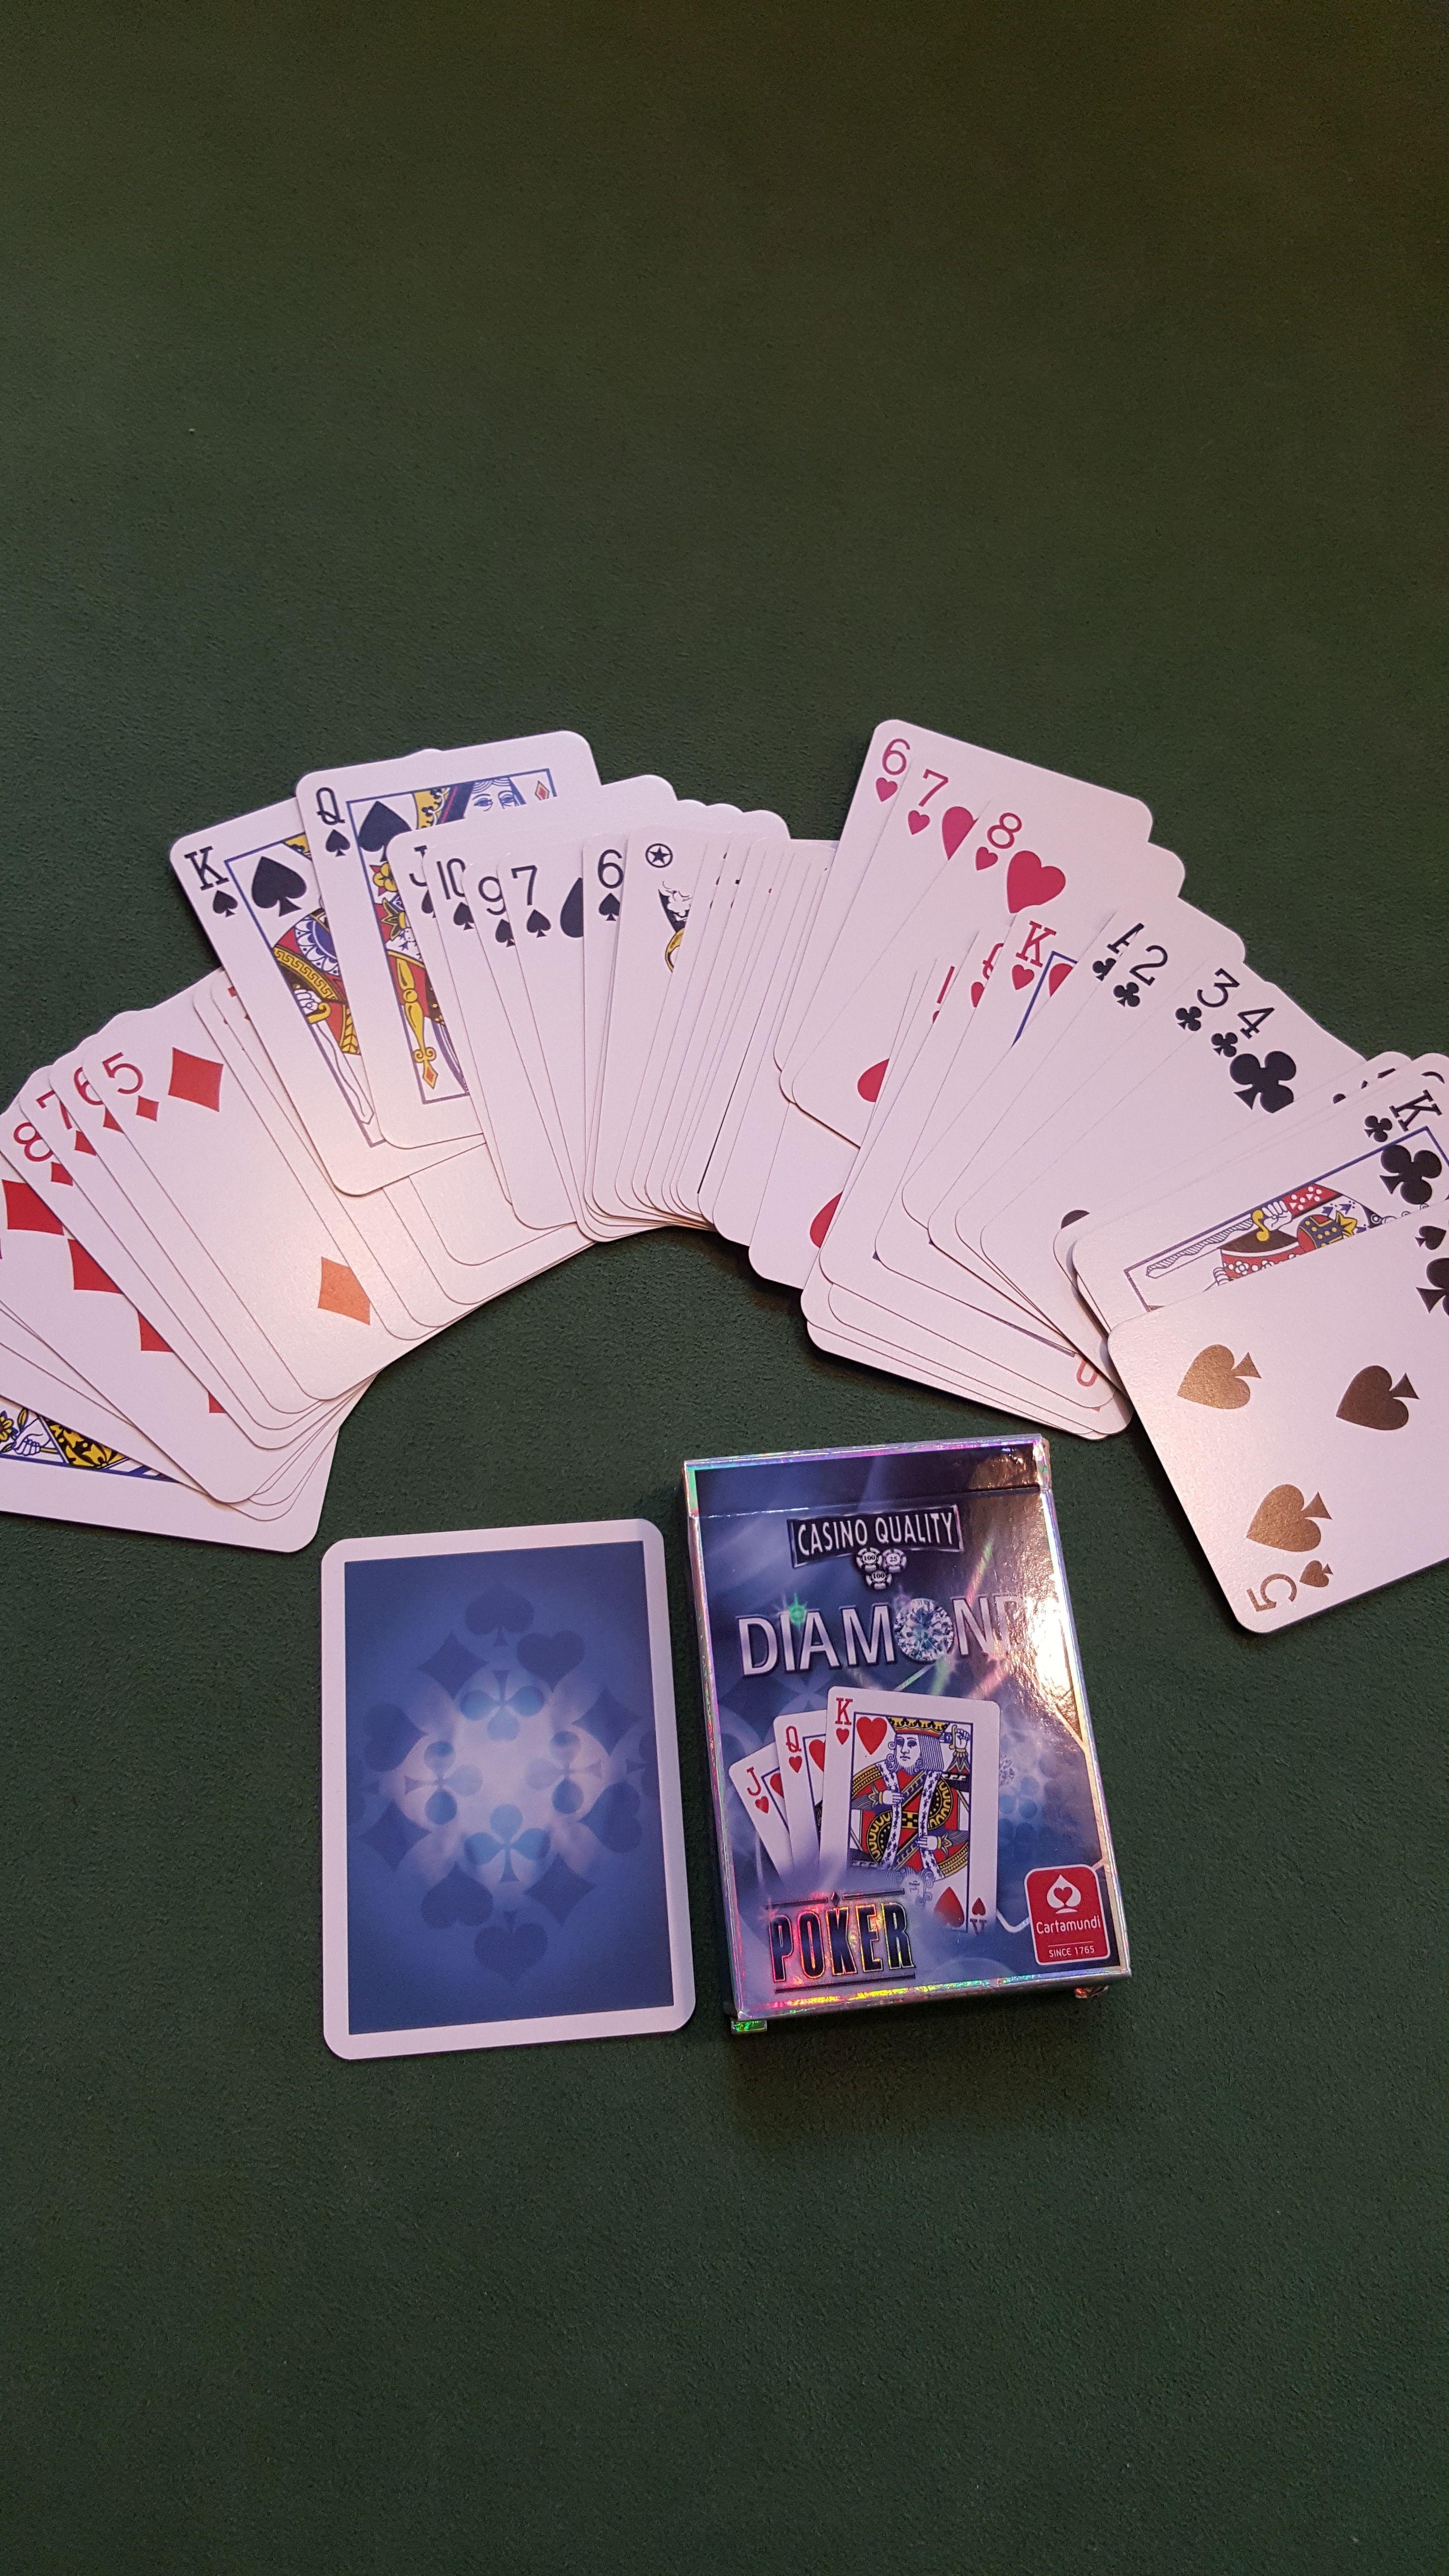 Diamond Pokerkarten Regular Face